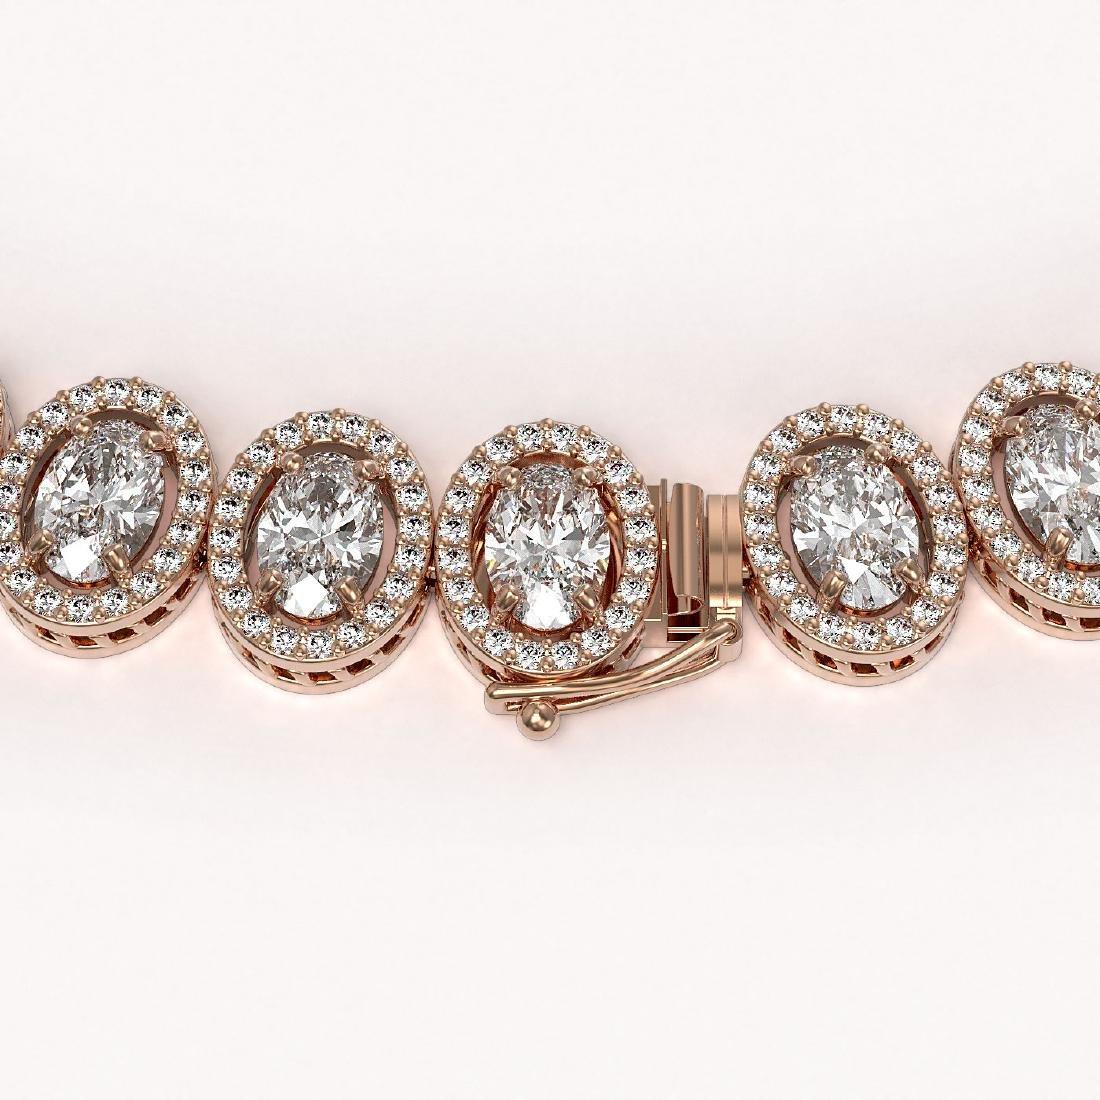 42.56 CTW Oval Diamond Designer Necklace 18K Rose Gold - 3